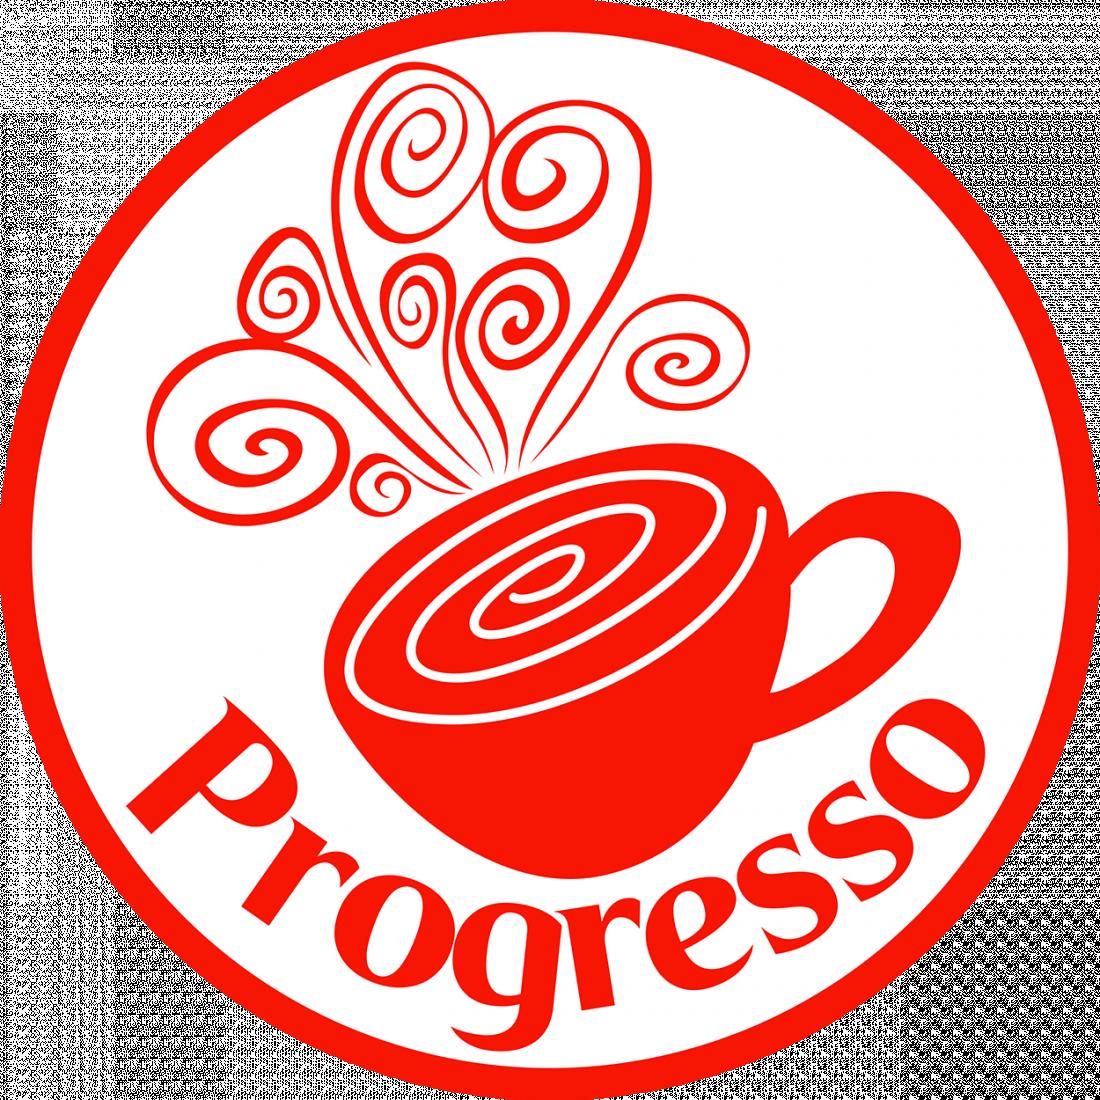 "Суши-сеты от 13 руб/до 1050 г в кафе ""Progresso"" в Бресте"